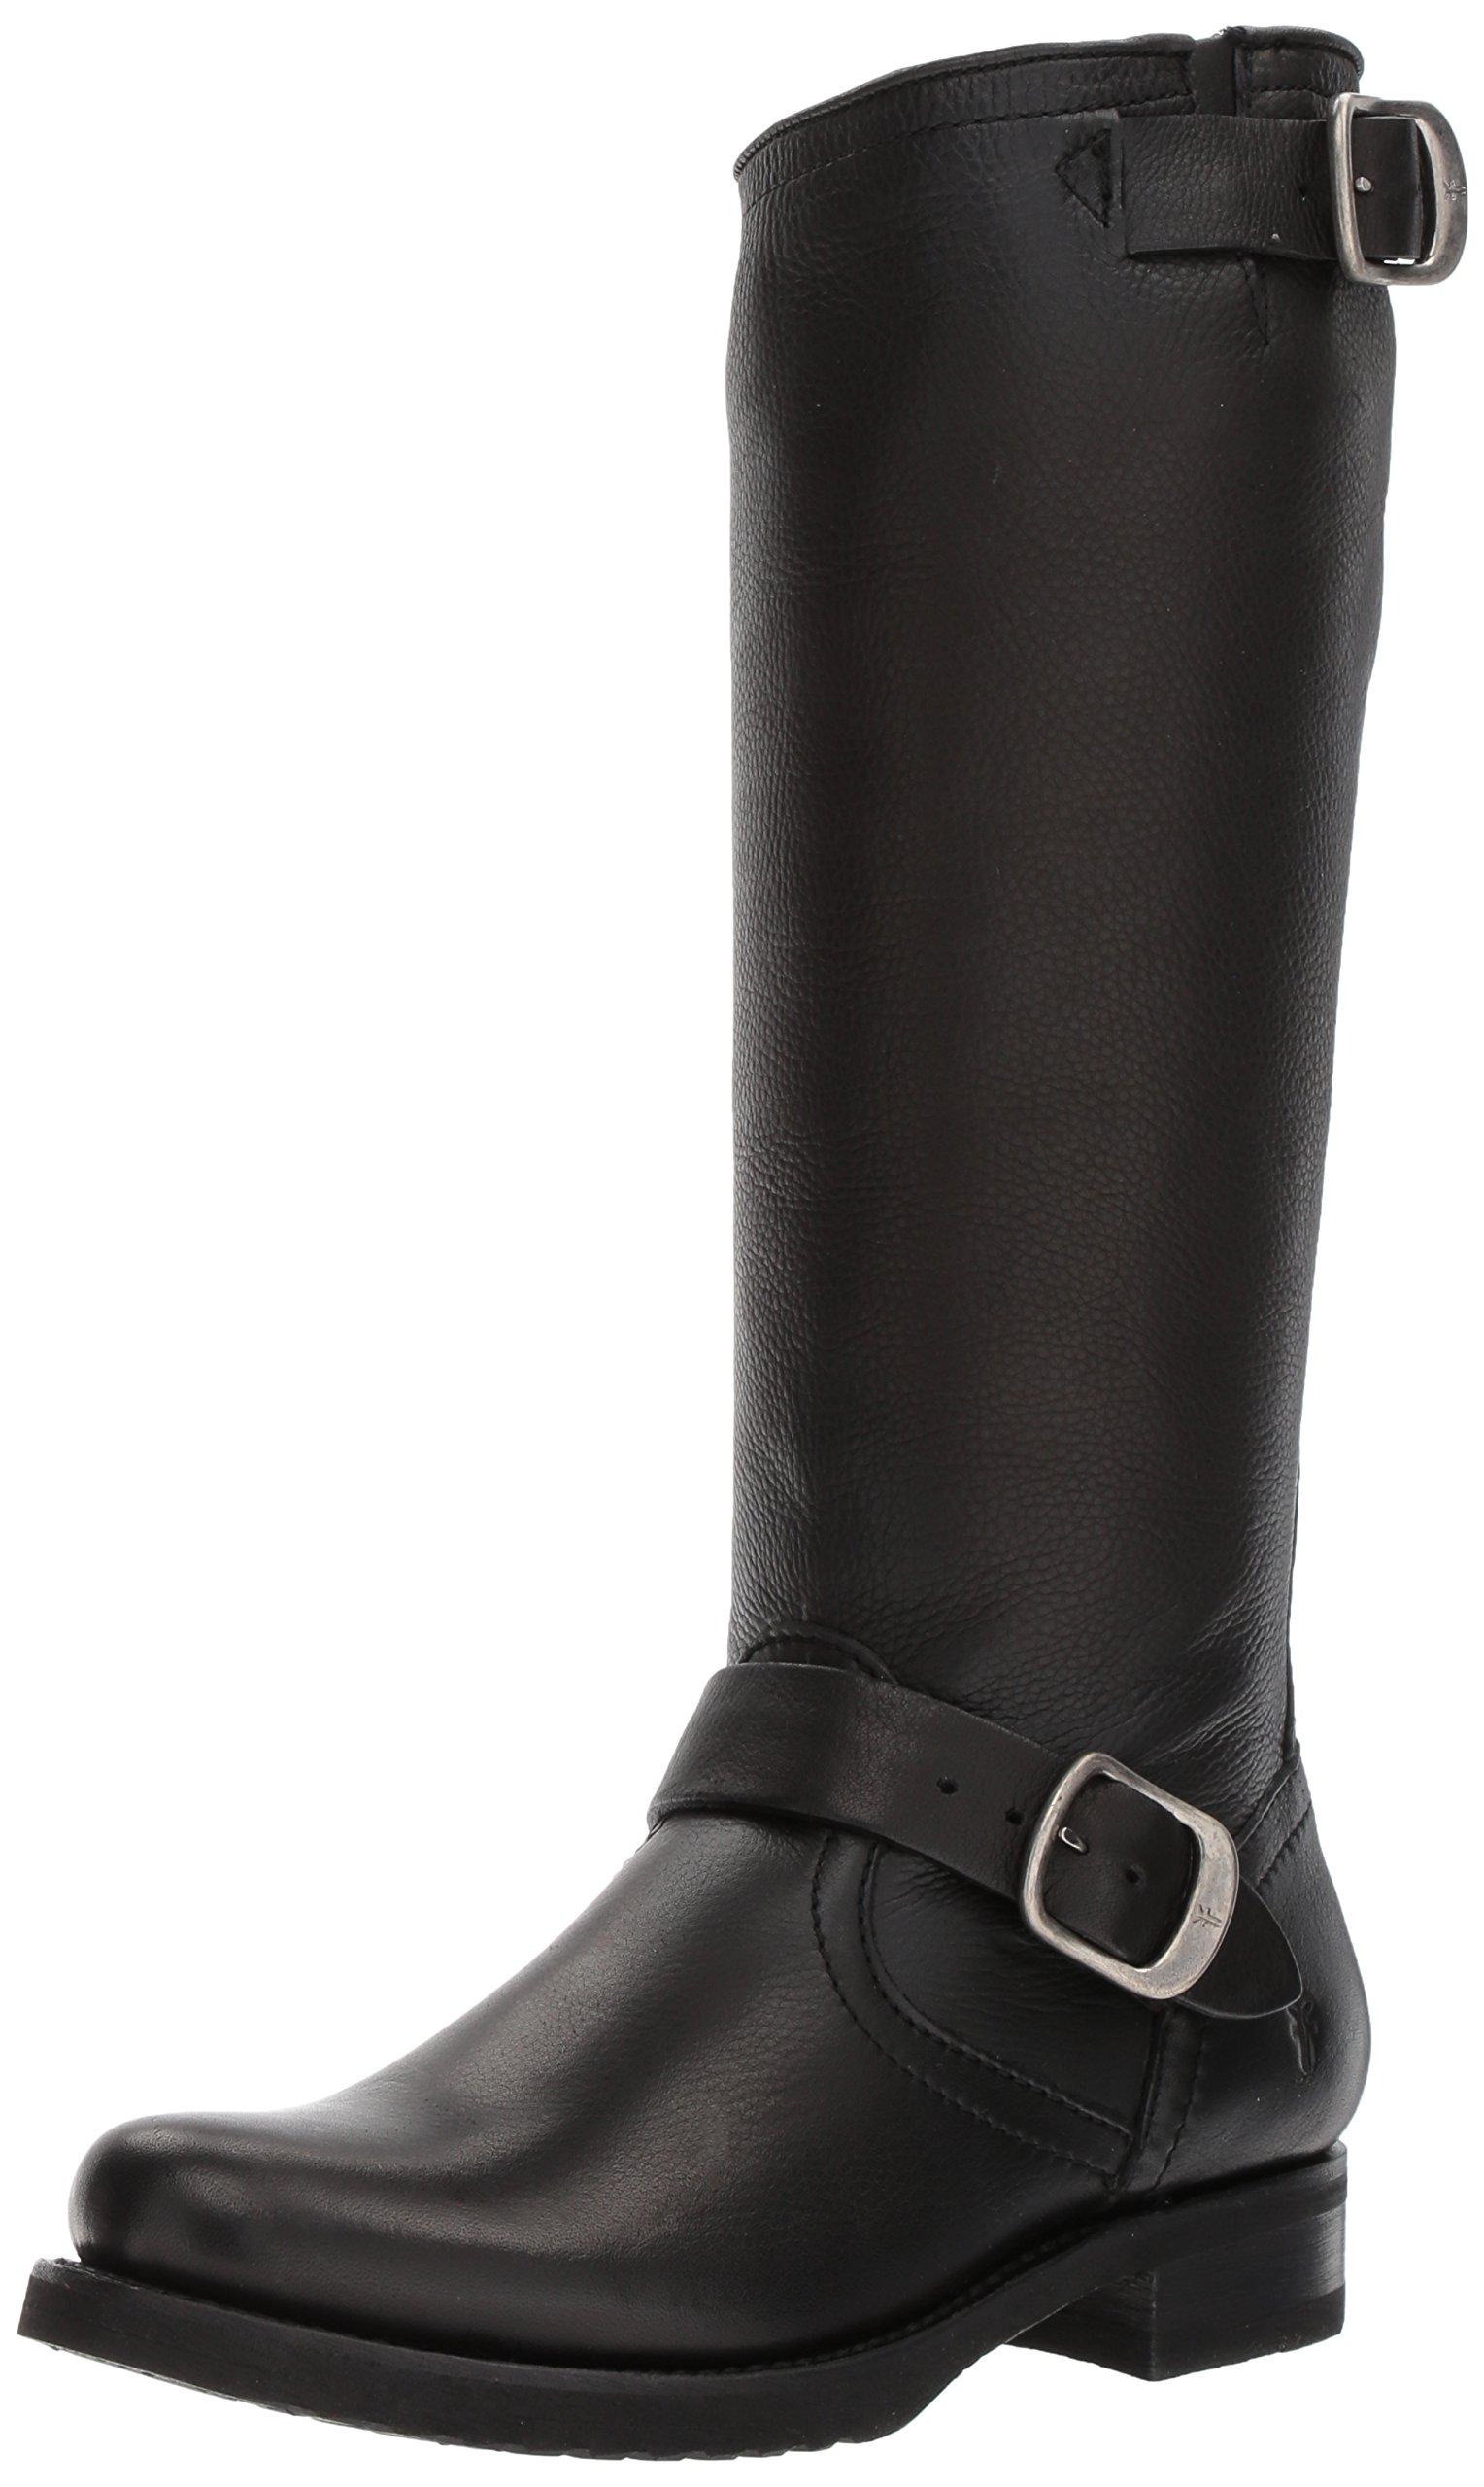 FRYE Women's Veronica 2 Slouch Boot, Black, 9 M US